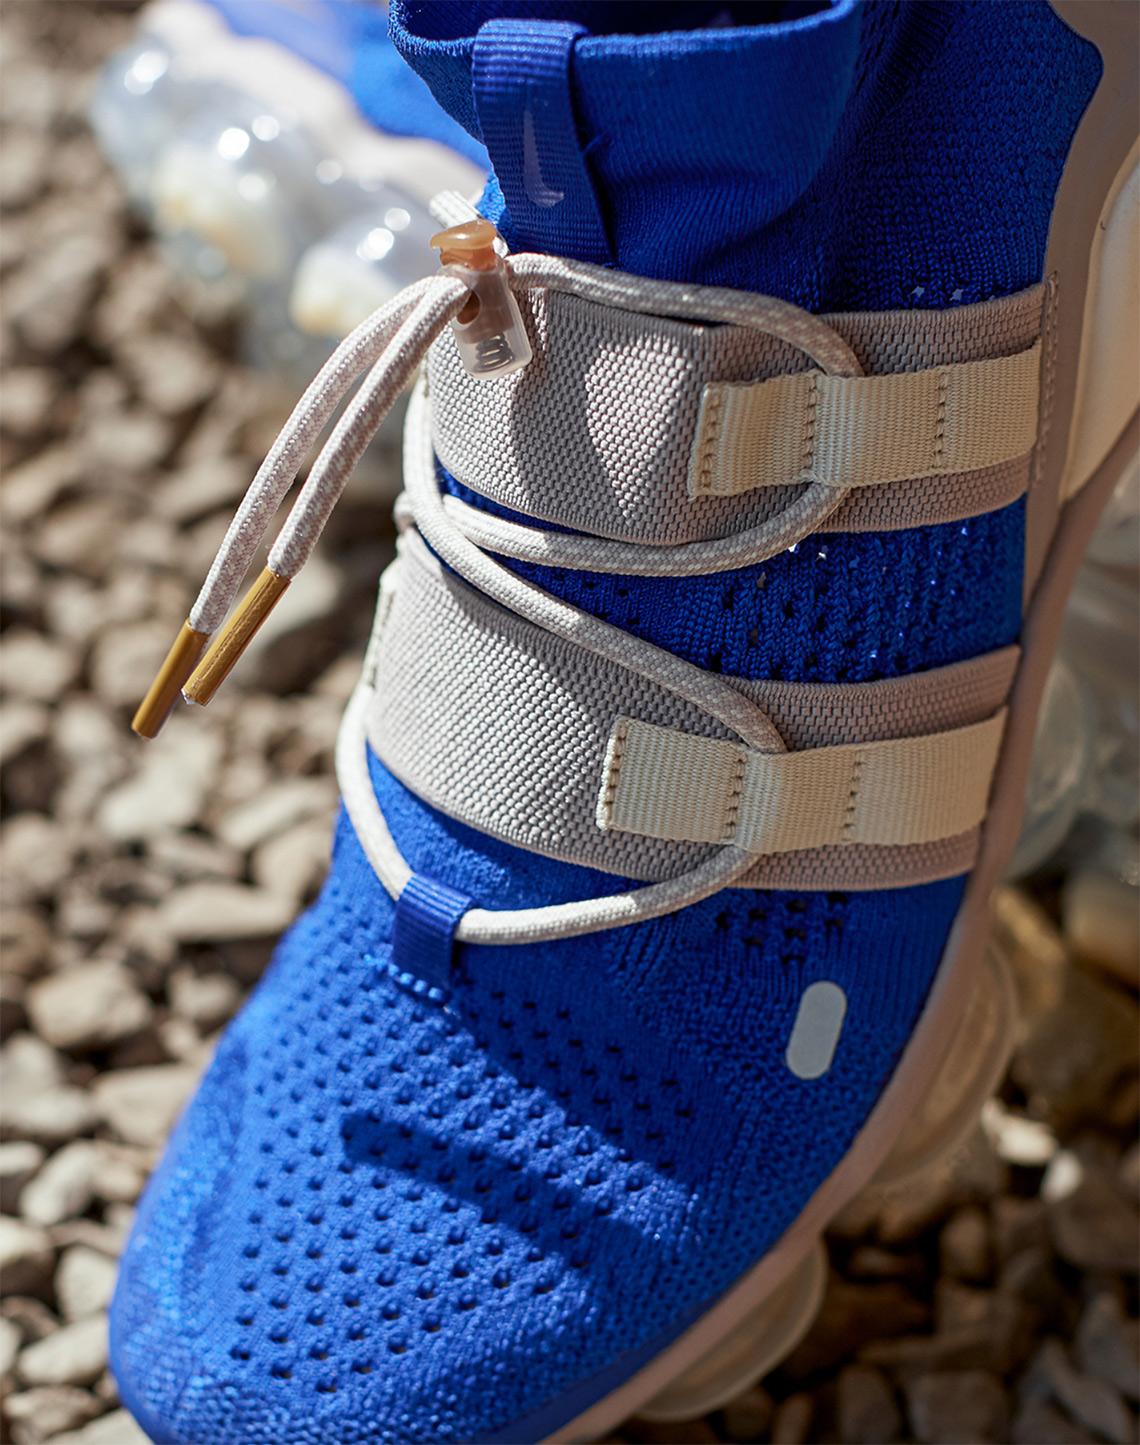 cheaper 46285 c089d Nike Vapormax Utility Racer Blue AH6834-402 Release Date ...